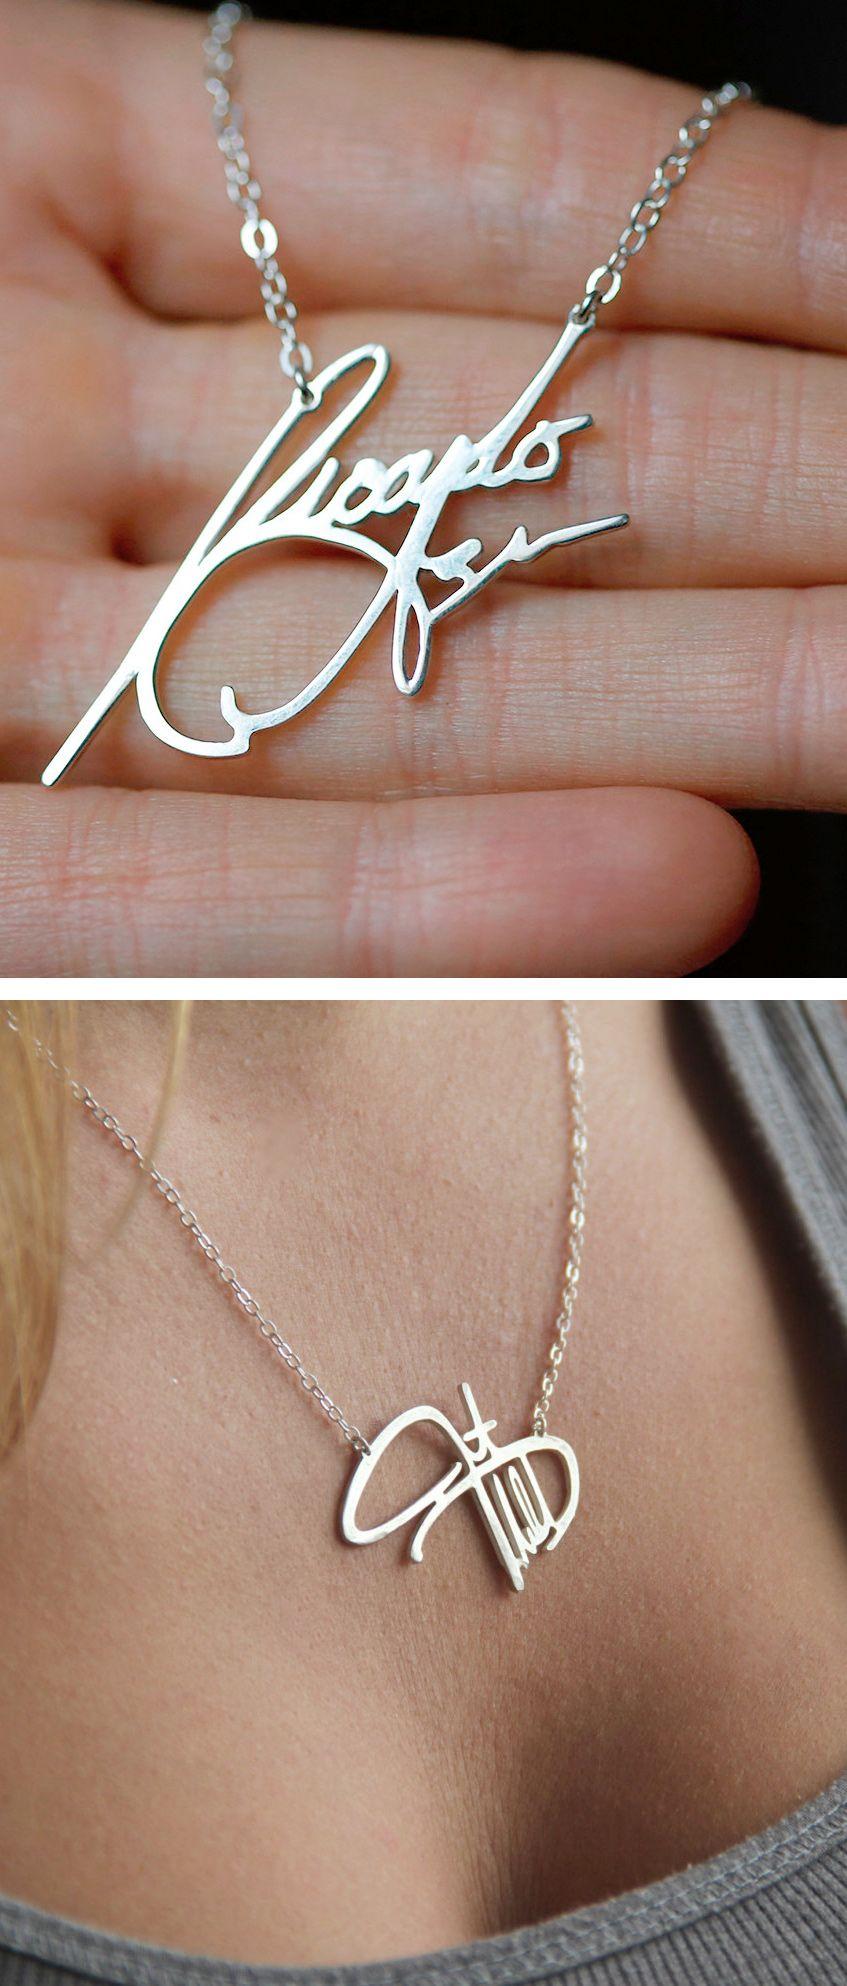 Memorial Necklace Personal Signature Necklace Silver